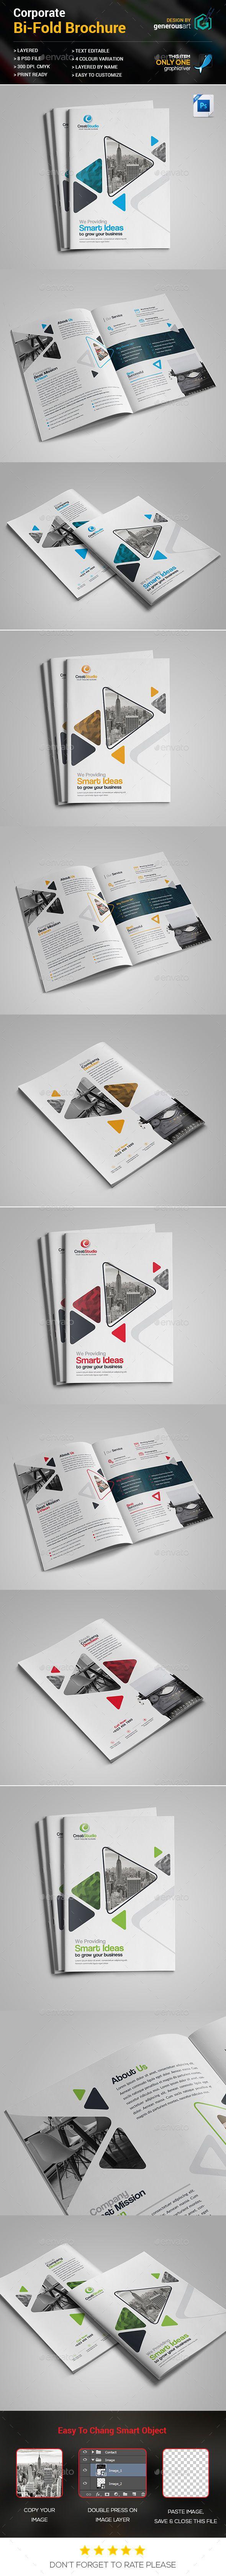 Business BiFold Brochure — Photoshop PSD #standard #black • Download ➝ https://graphicriver.net/item/business-bifold-brochure/19287577?ref=pxcr